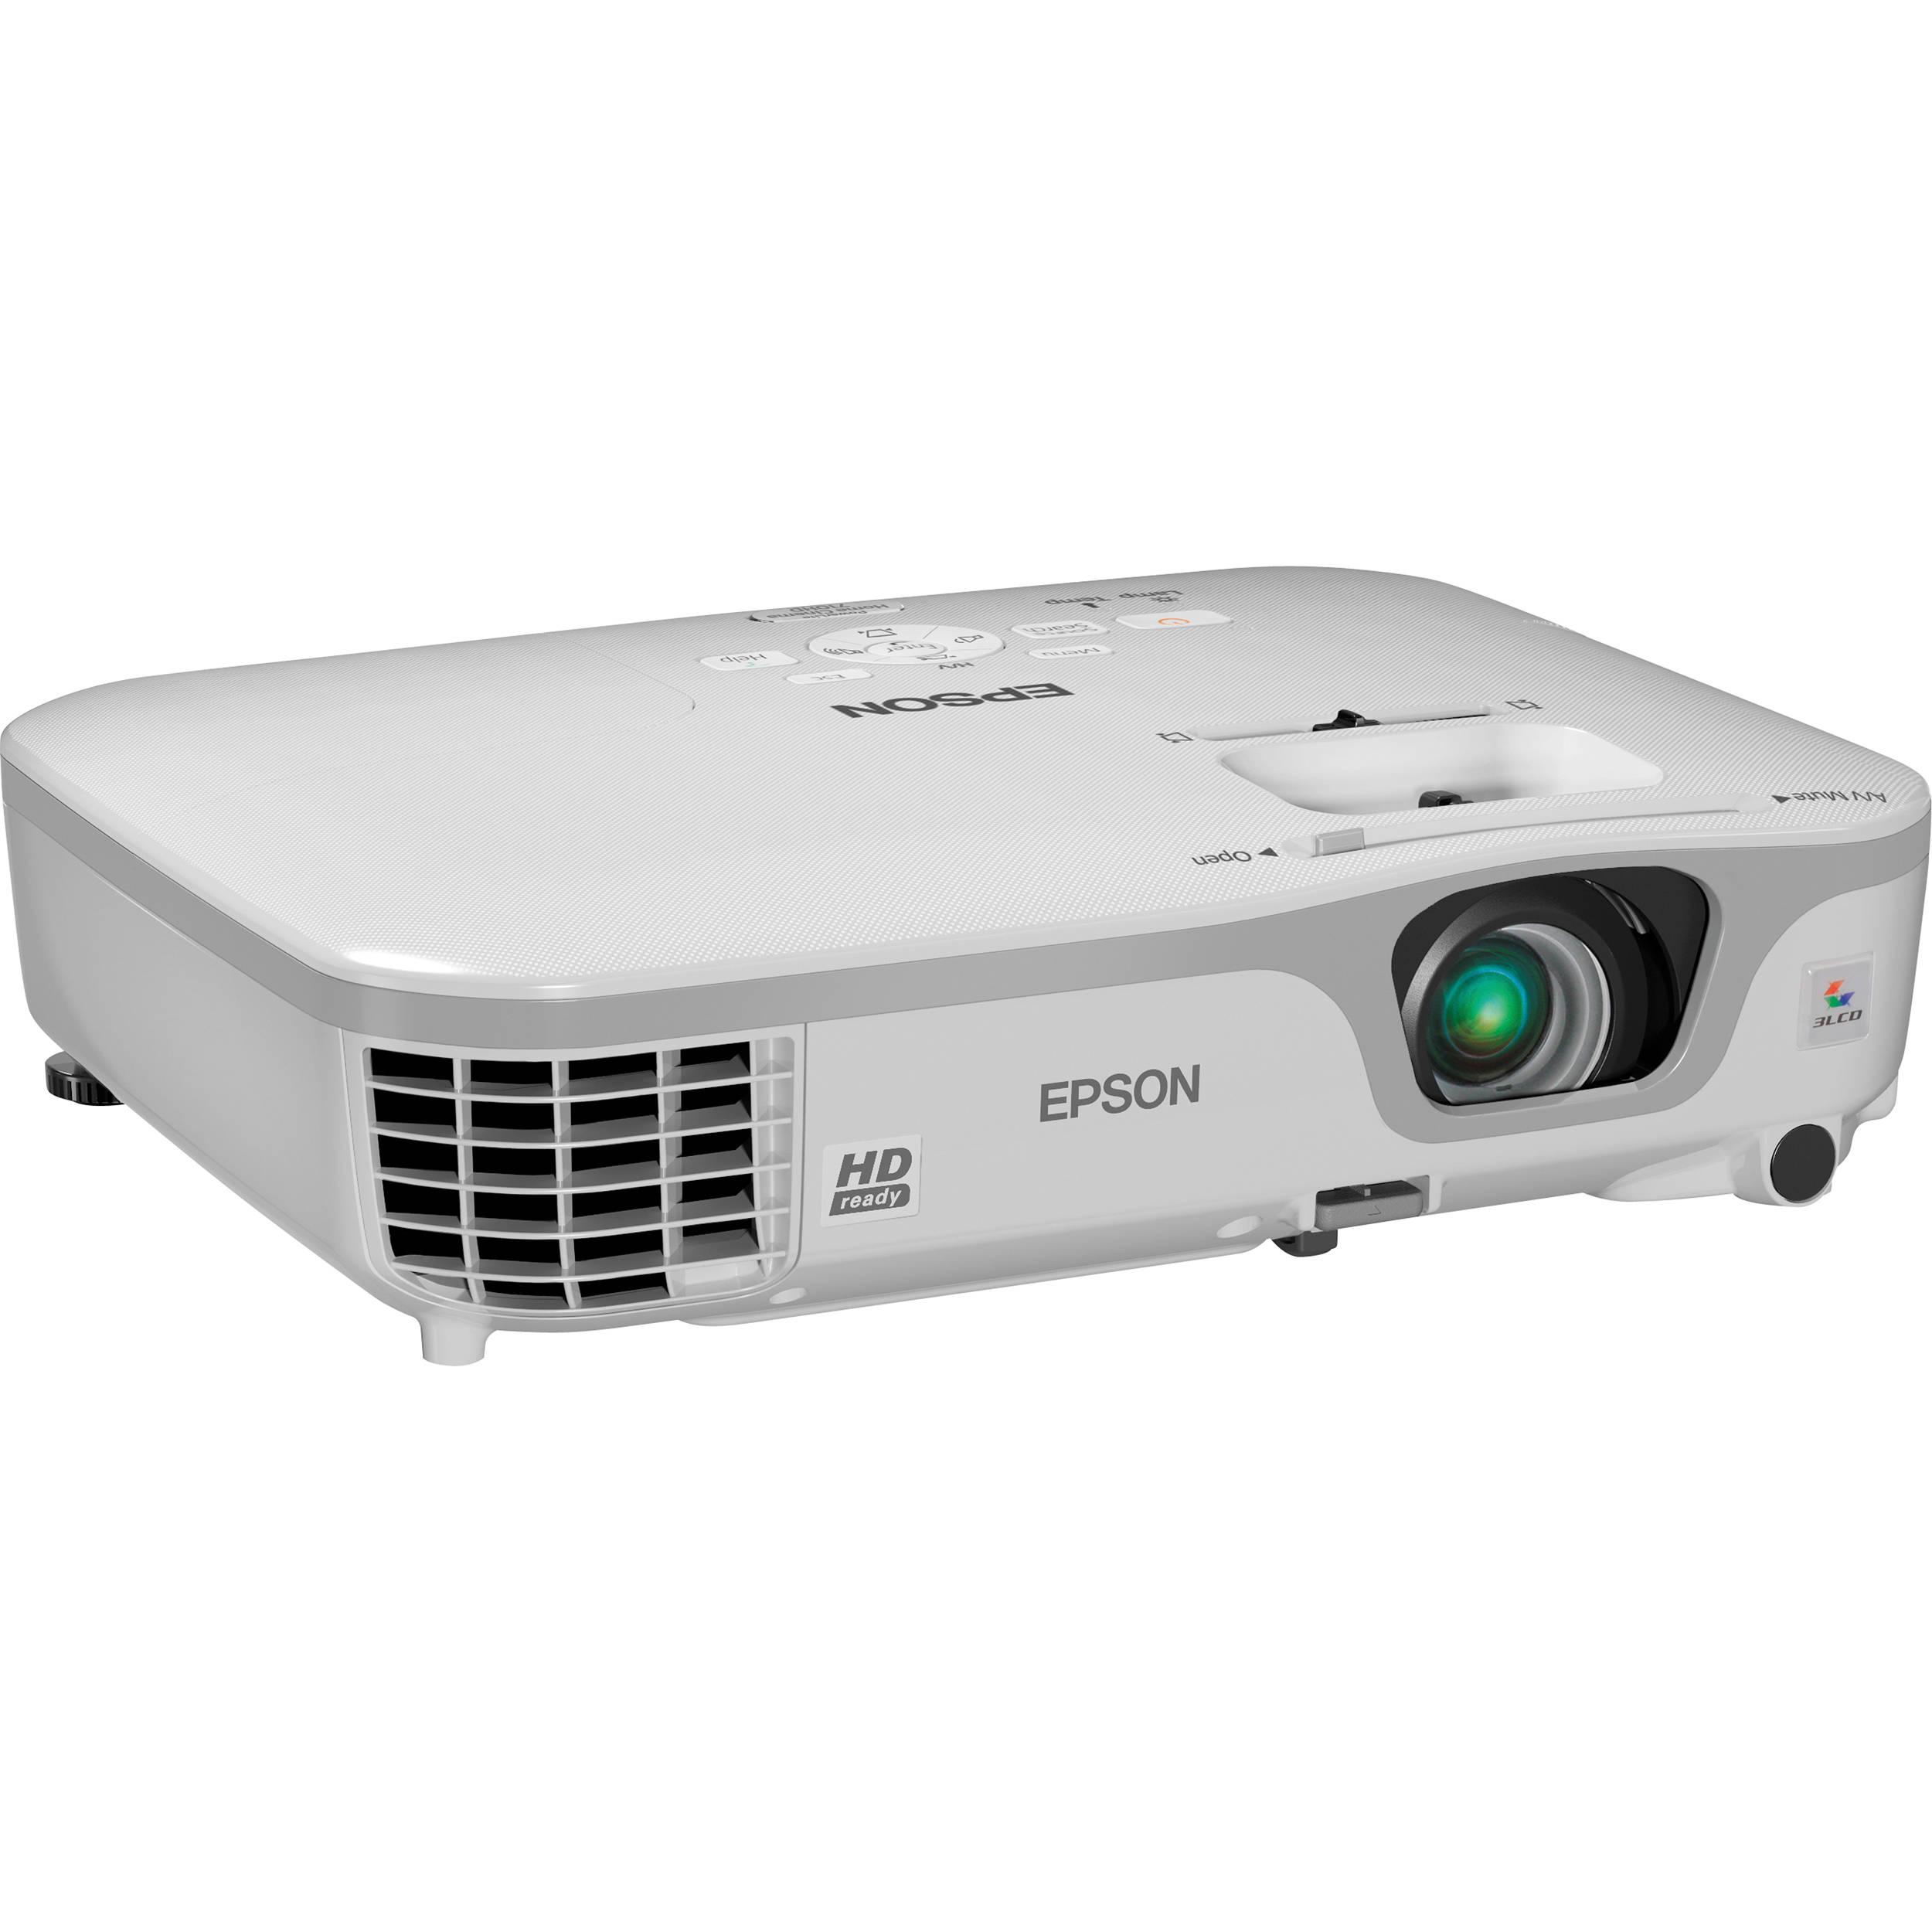 epson powerlite home cinema 710hd projector v11h475020 b h photo rh bhphotovideo com Epson Printers Epson L380 Manual